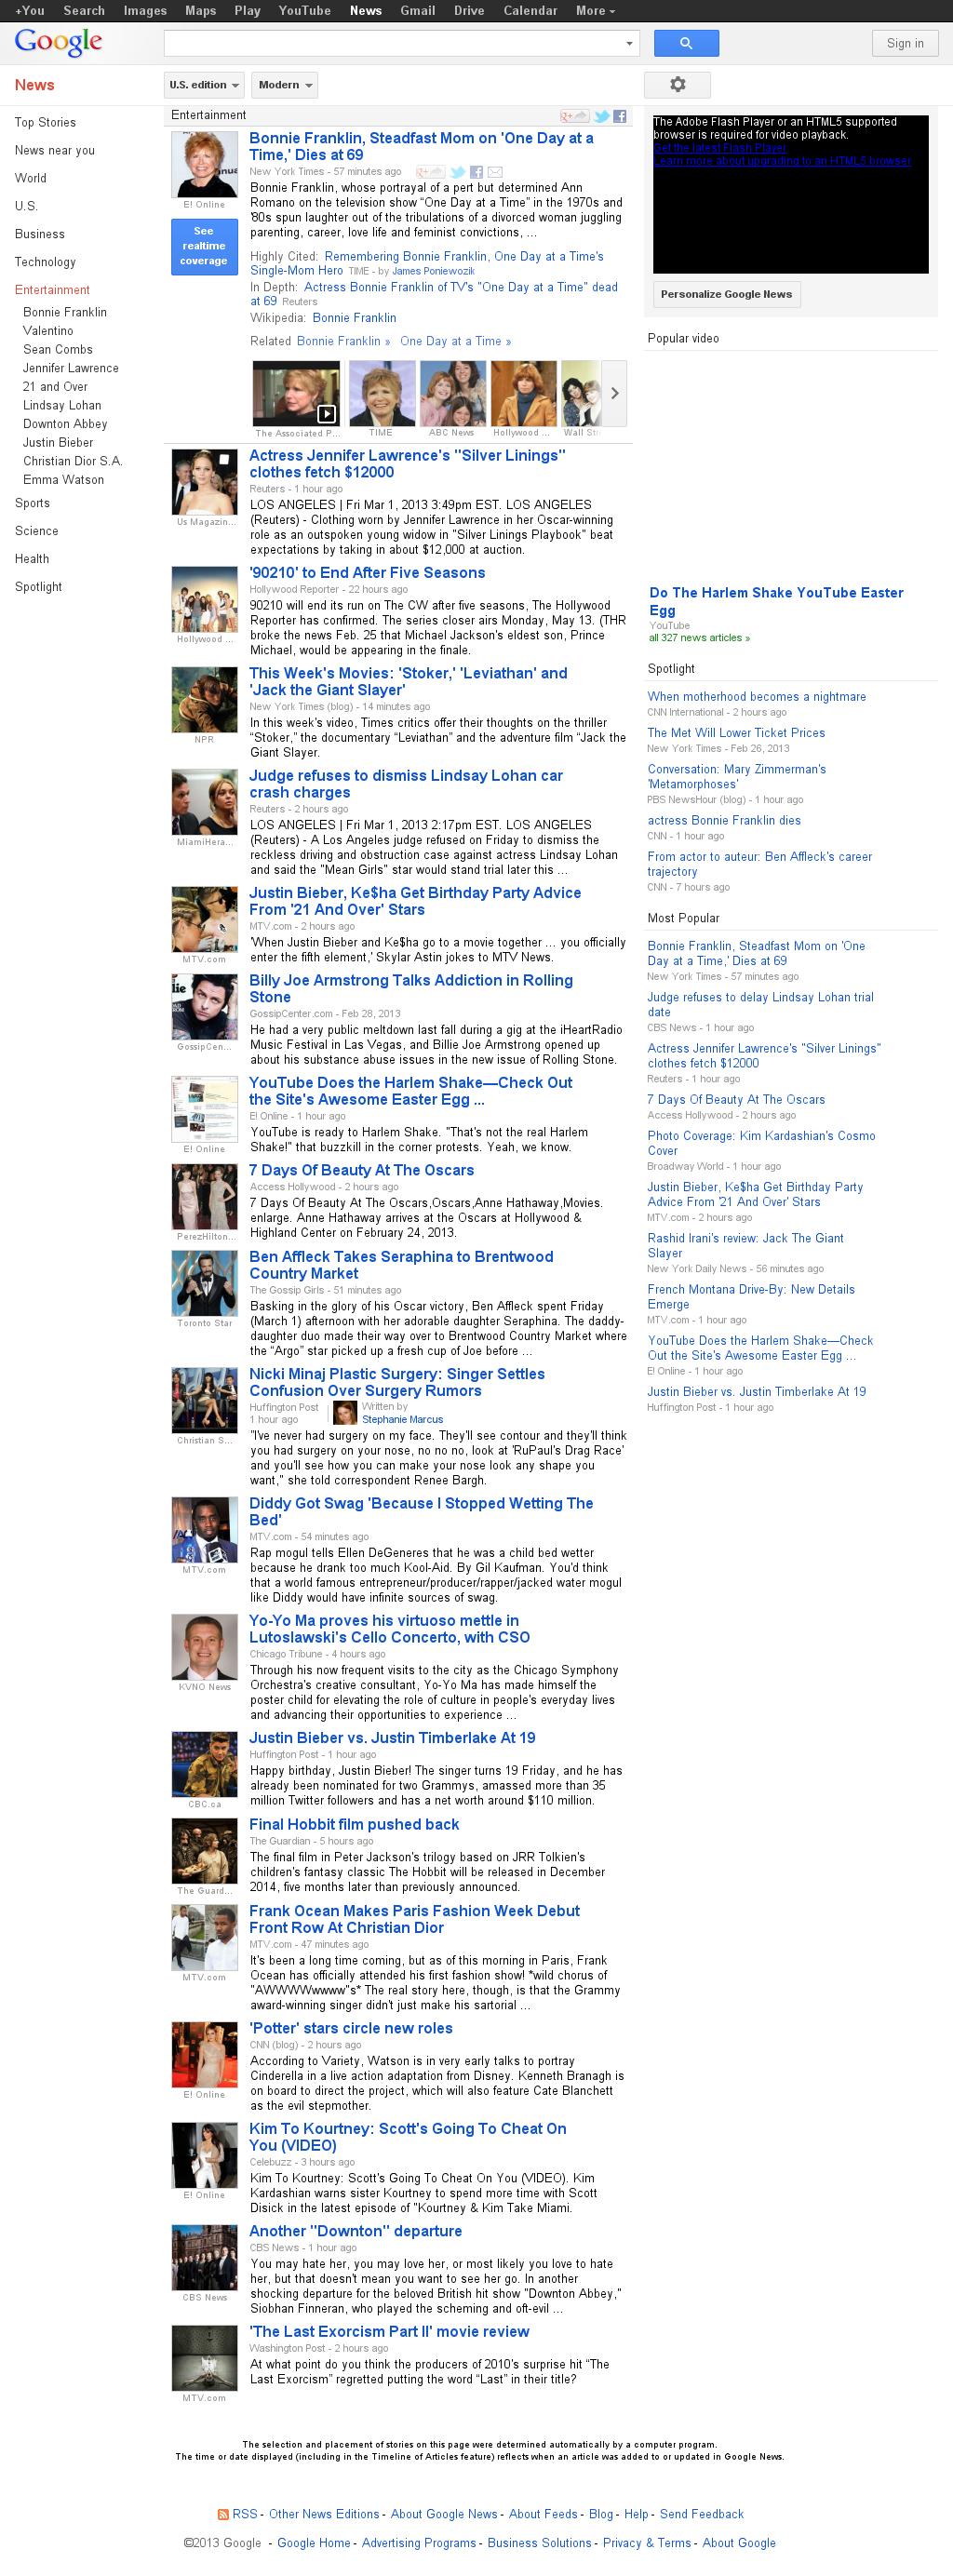 Google News: Entertainment at Friday March 1, 2013, 10:07 p.m. UTC